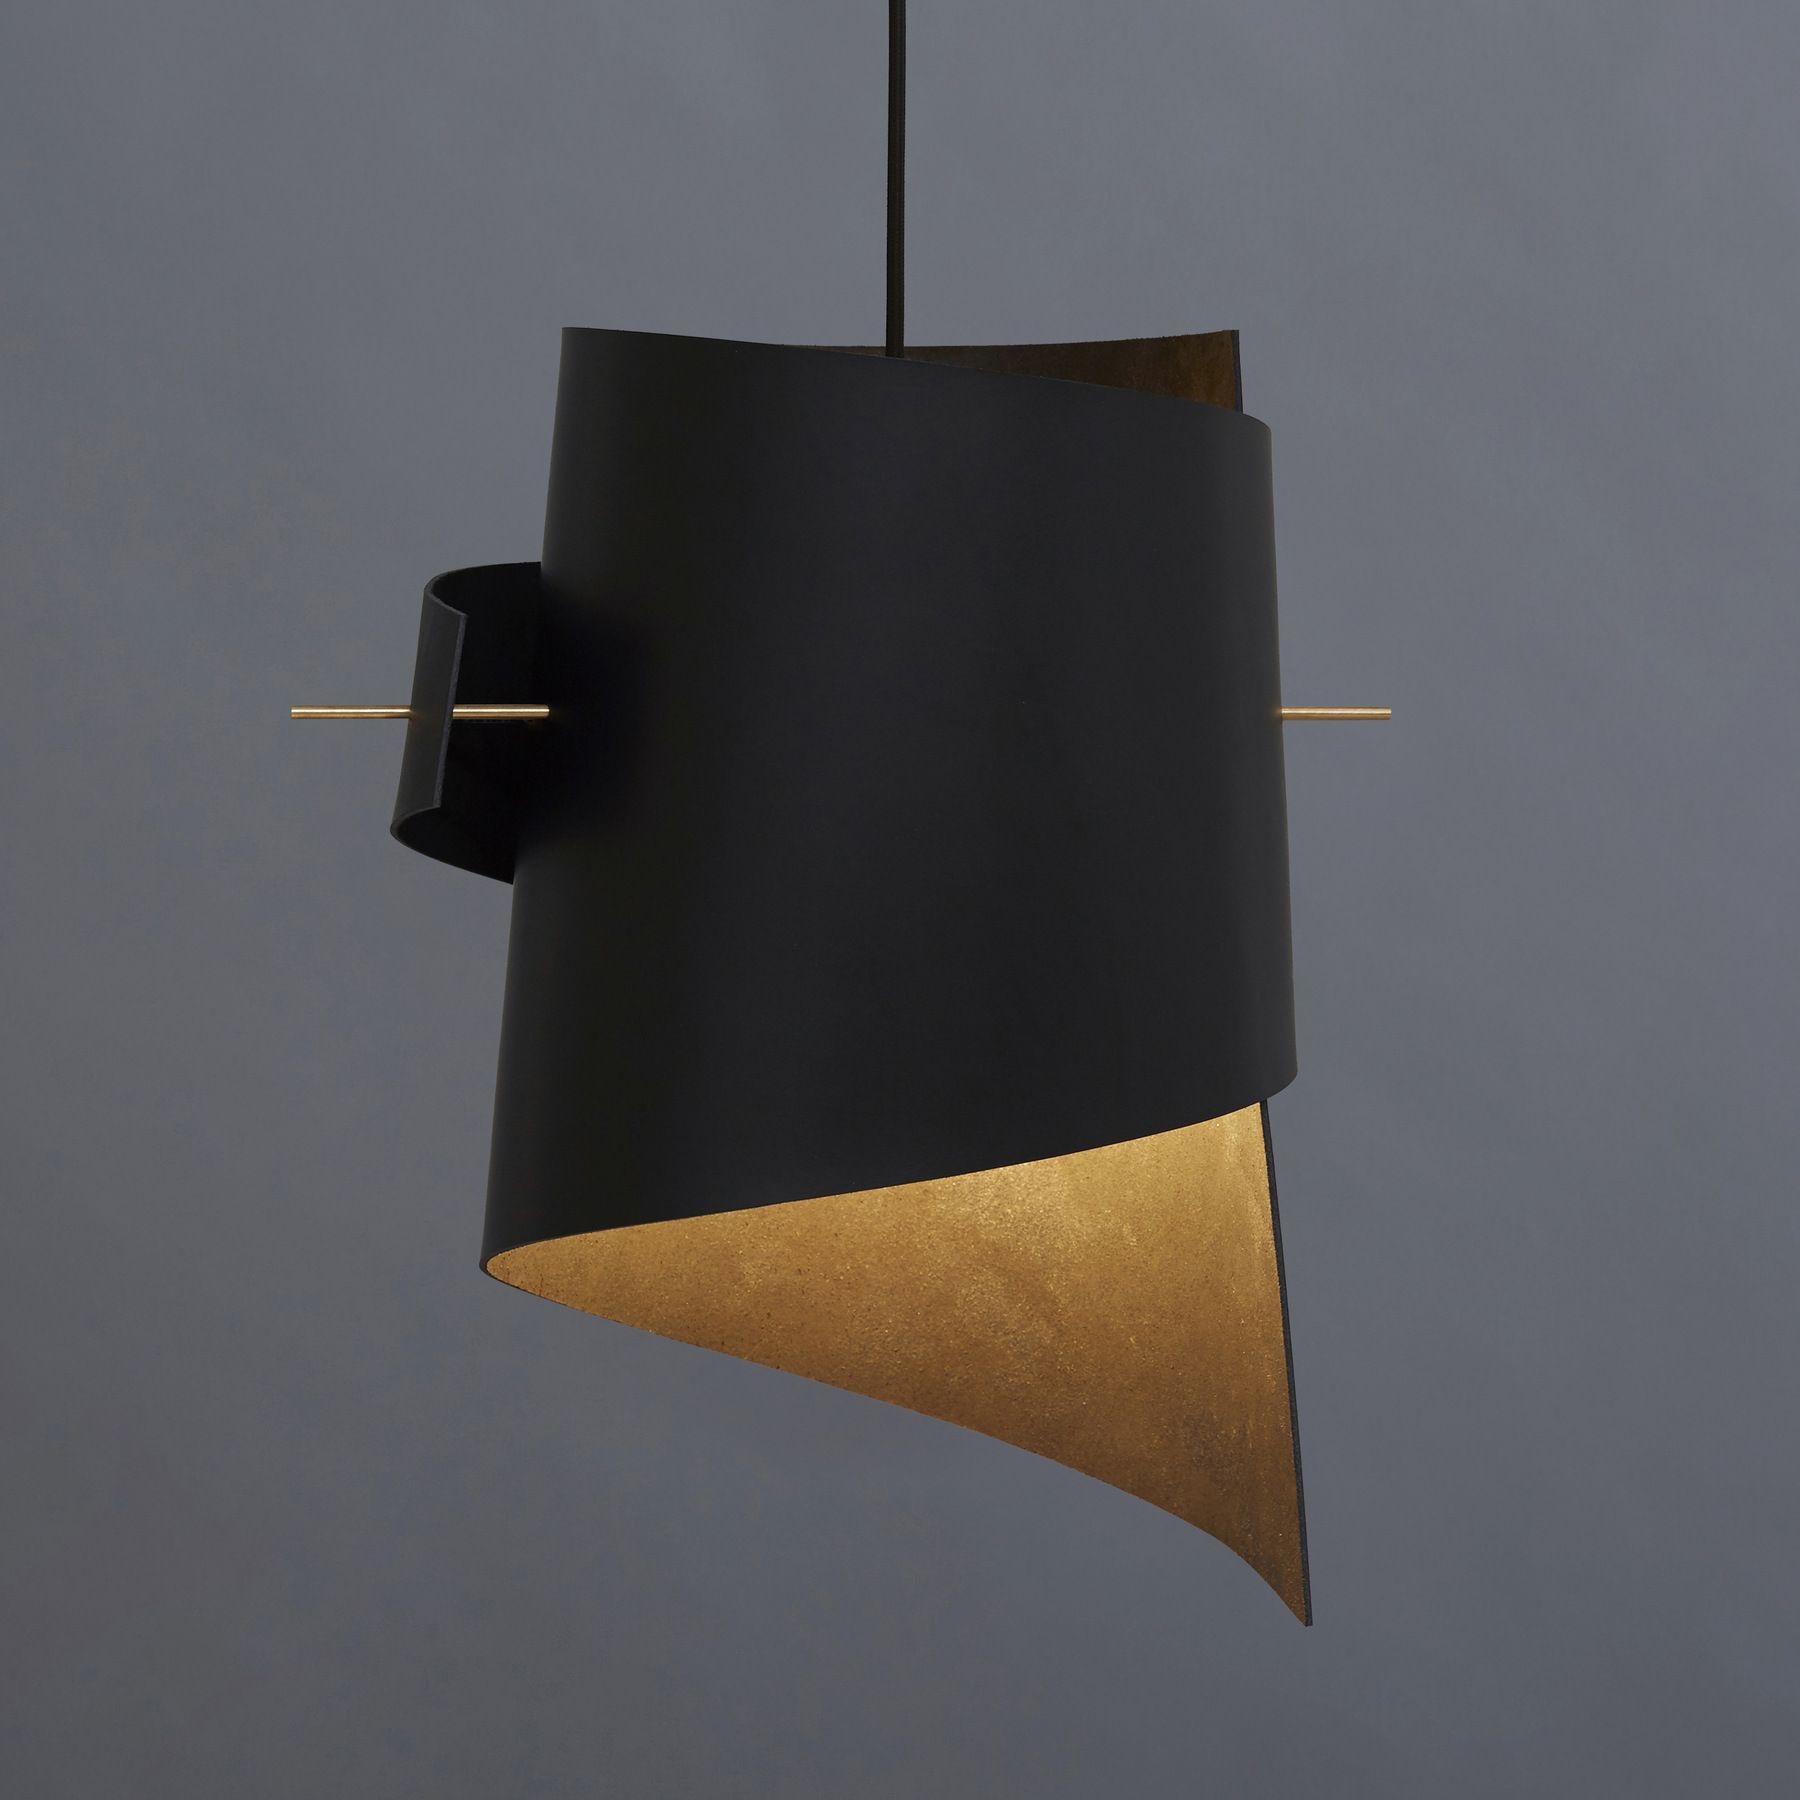 Buy Online Large Leather Black By Moijn Led Handmade Pendant Lamp Design Kristoffer Munk